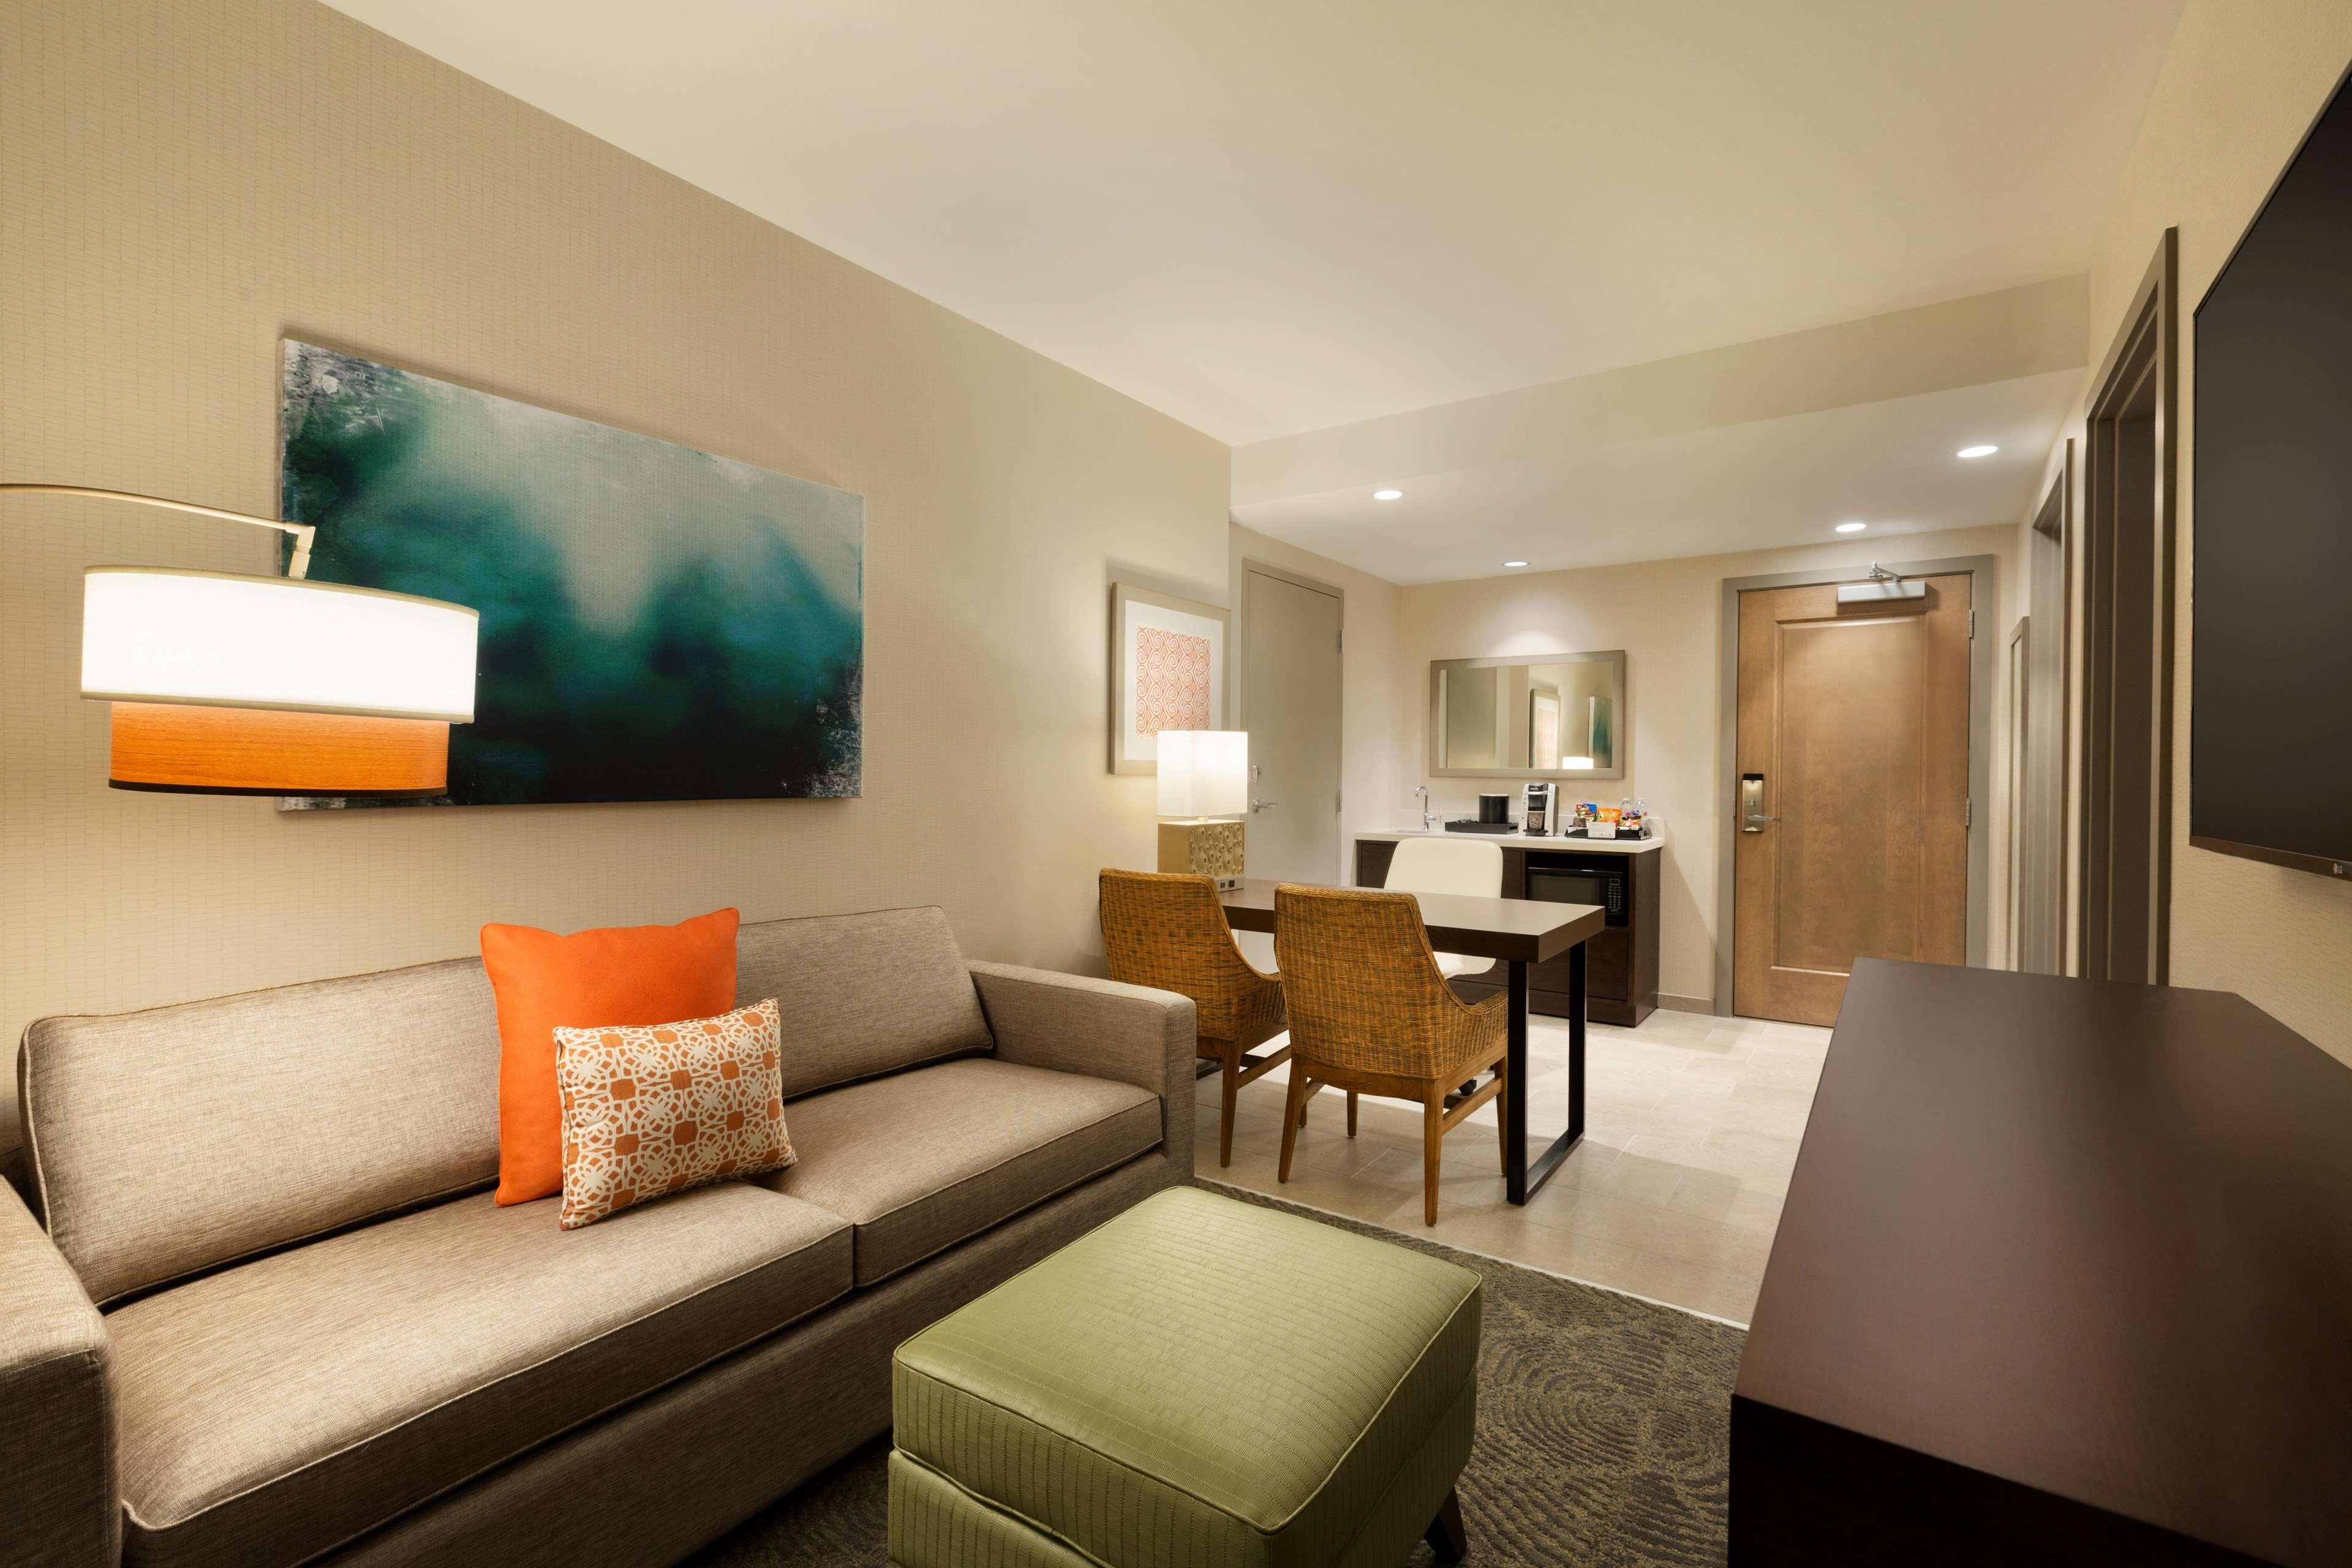 Embassy Suites by Hilton Oahu Kapolei image 42